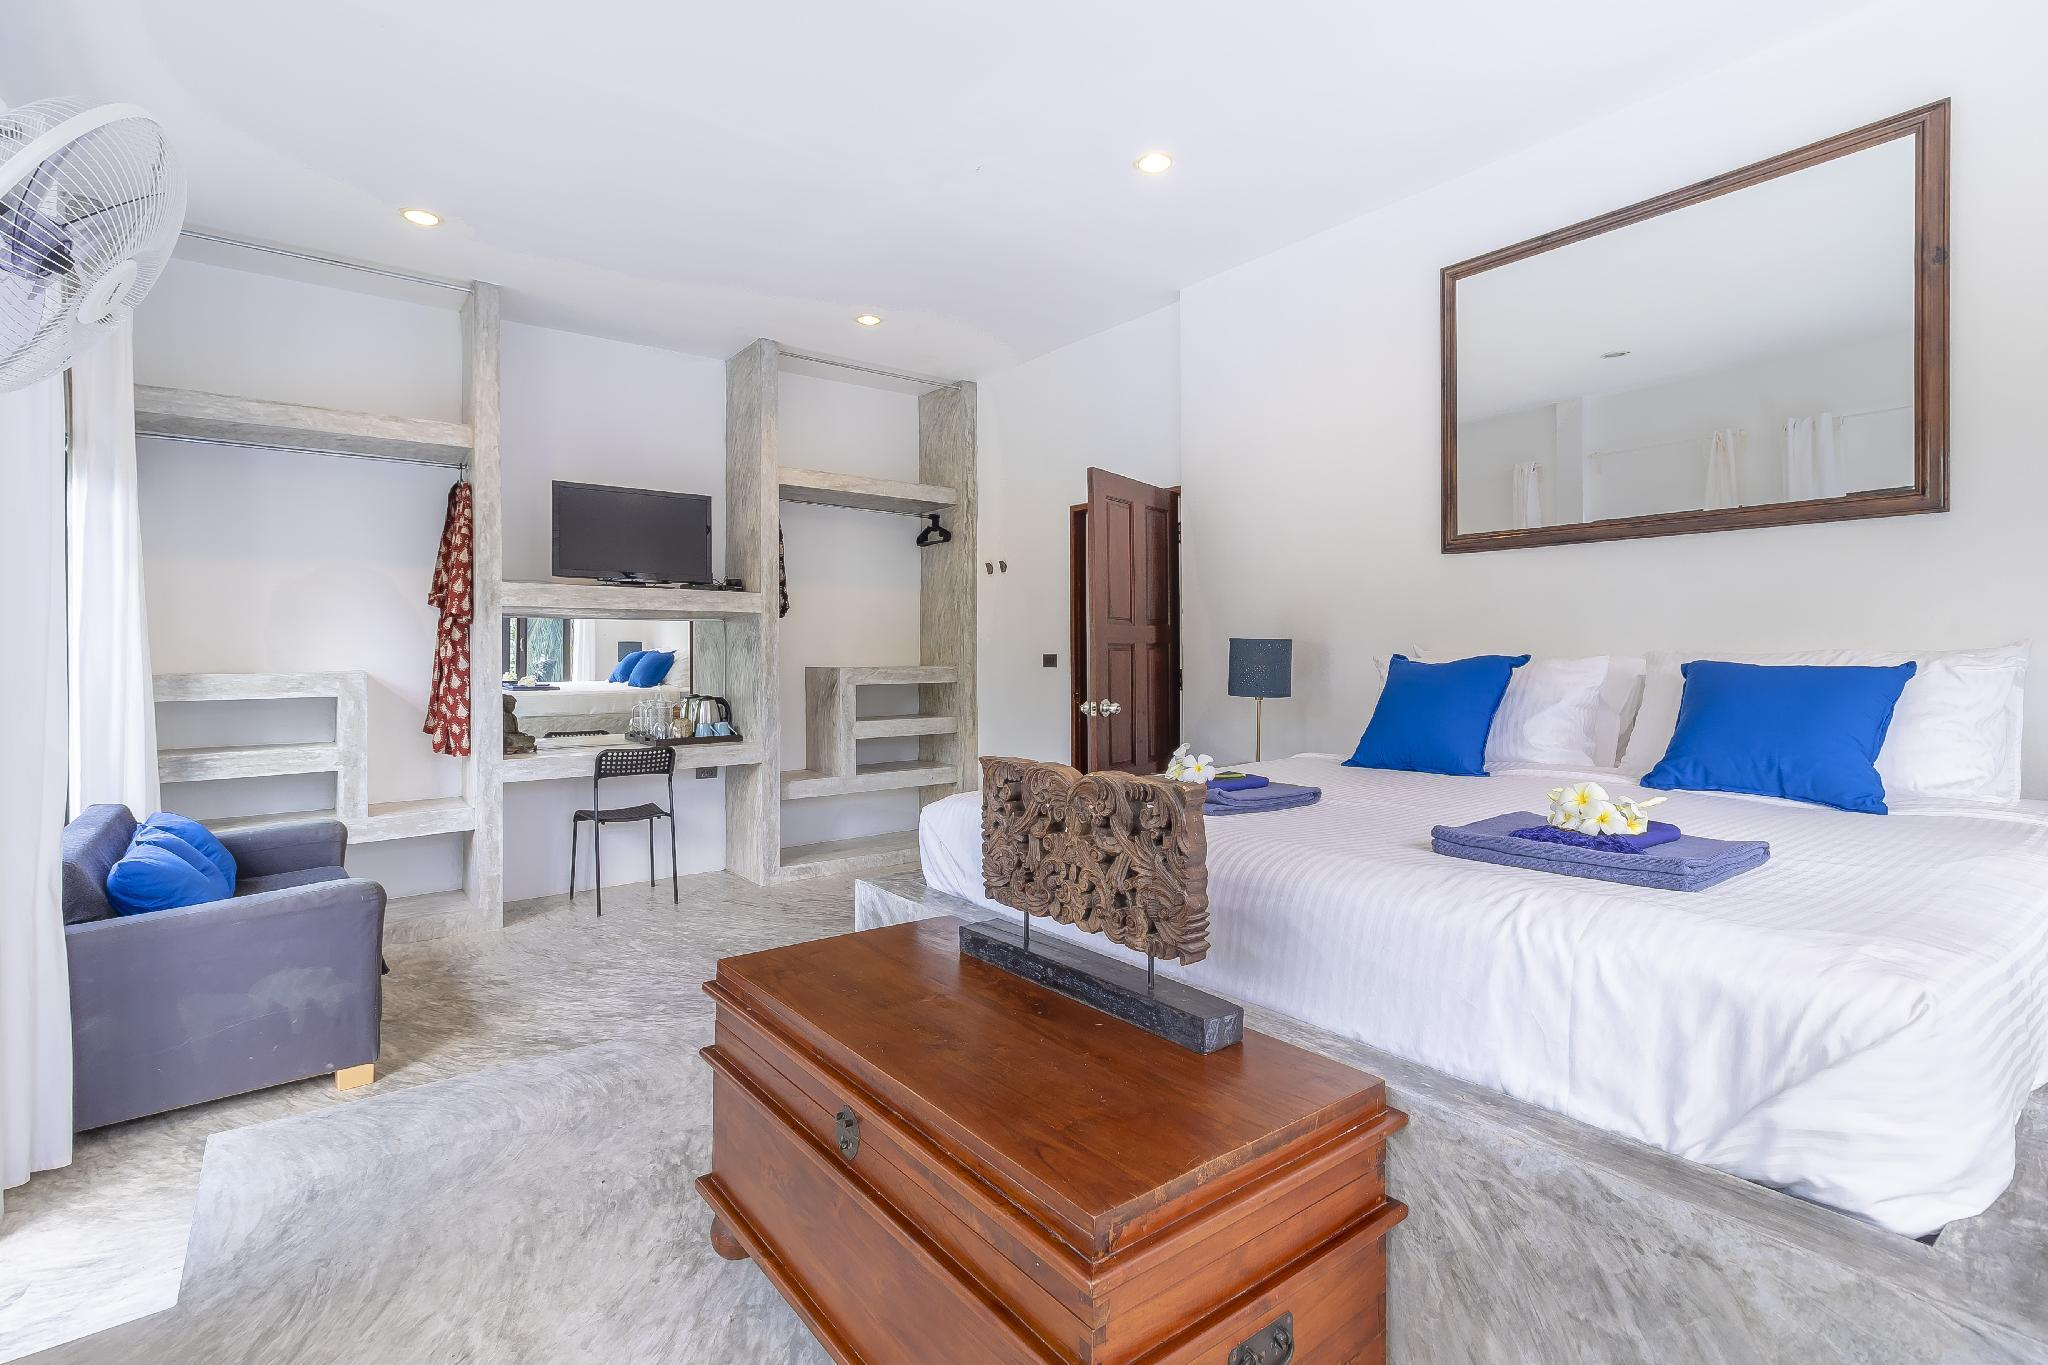 Spacious 3 bed with mountain views close to beach วิลลา 2 ห้องนอน 2 ห้องน้ำส่วนตัว ขนาด 275 ตร.ม. – ไทรรี